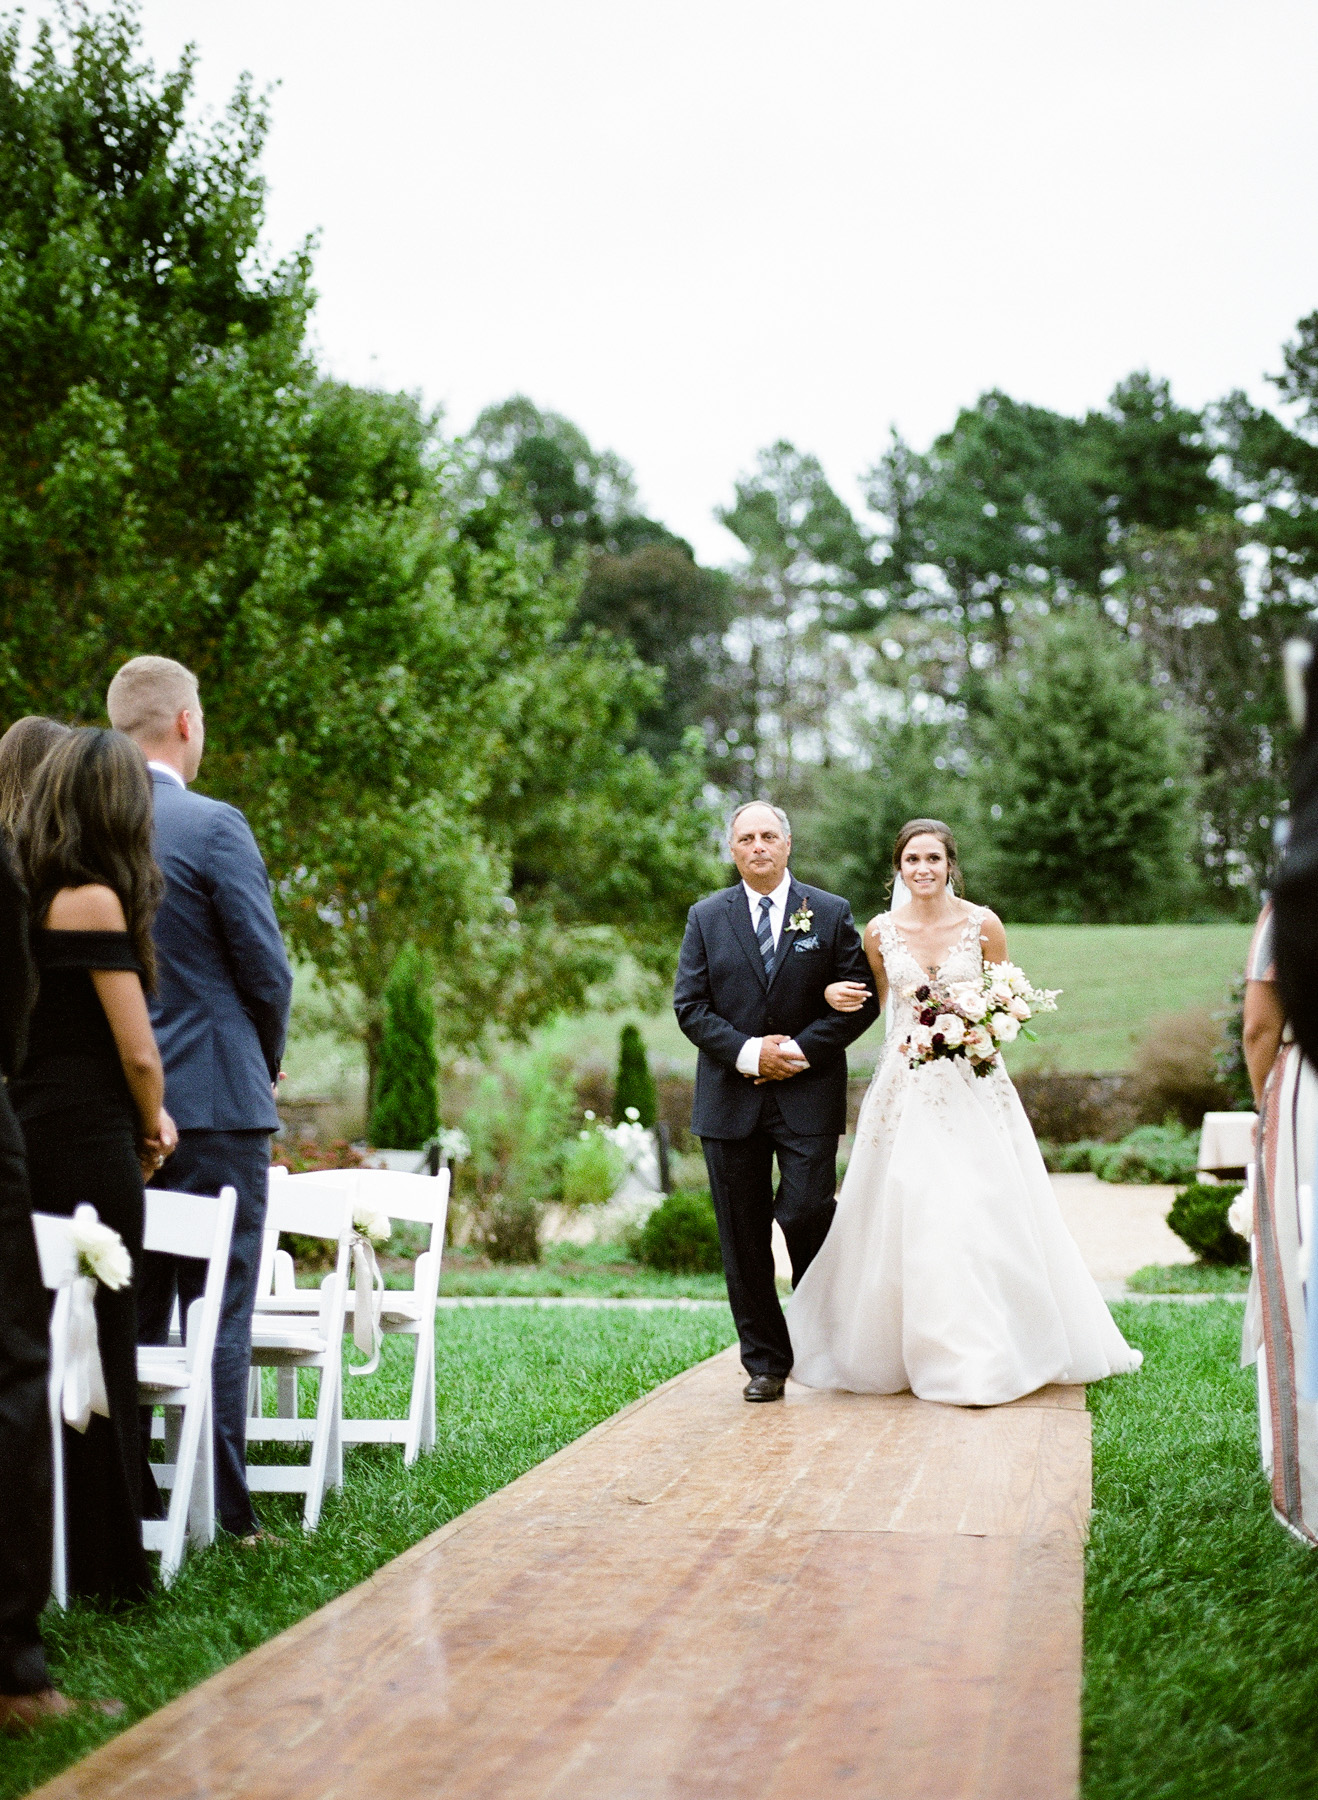 Pippin-Hill-Farm-and-Vinyards-Wedding-Film-Photography-57.jpg